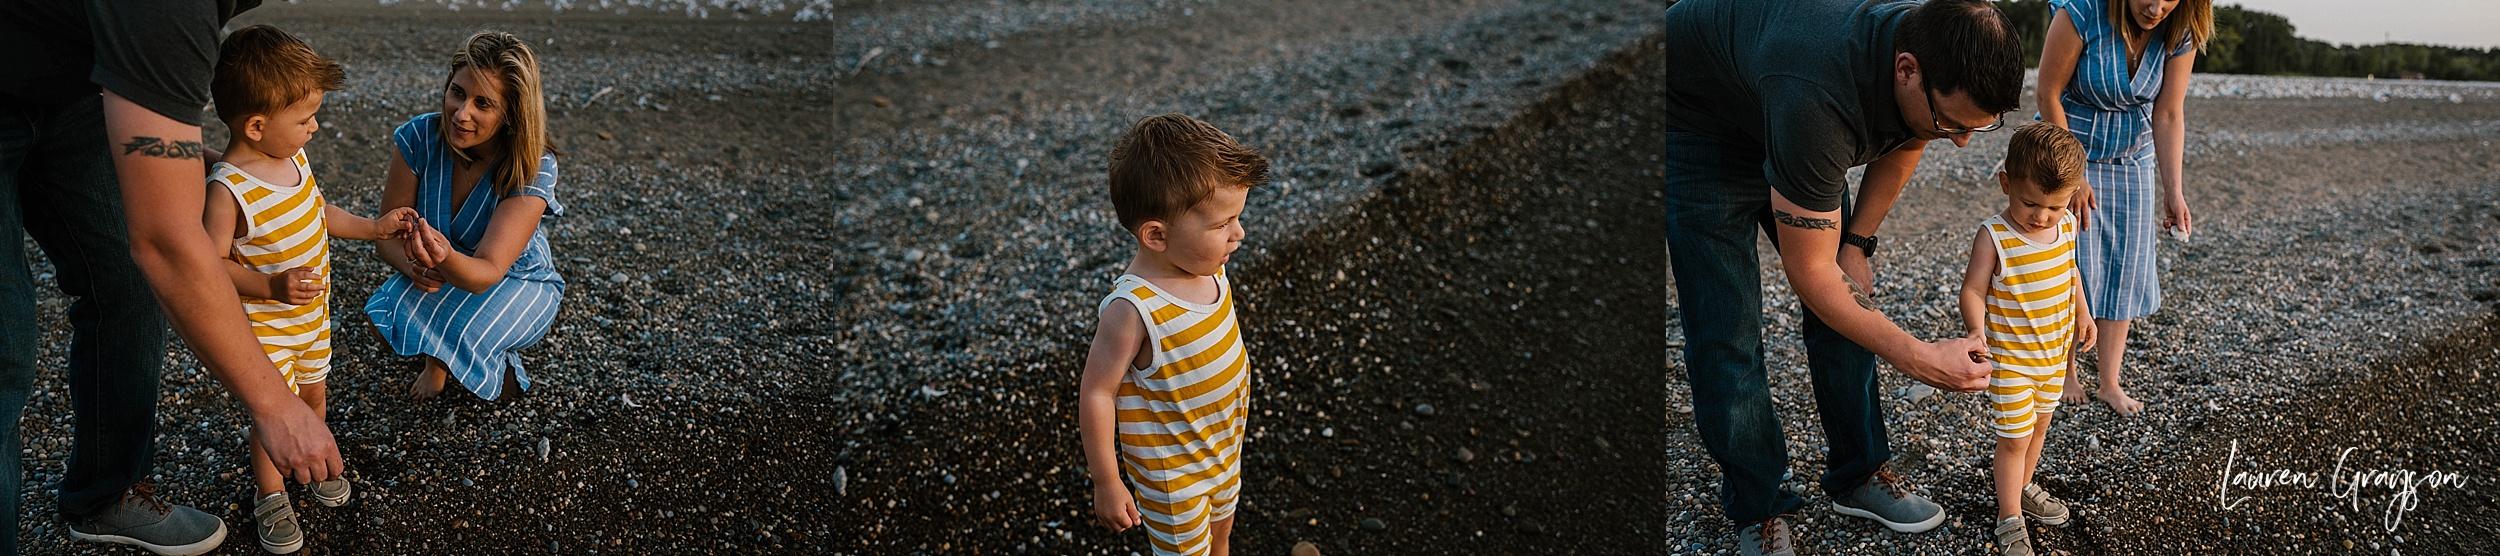 lauren-grayson-photography-cleveland-ohio-photographer-mentor-headlands-beach-maternity-session-2018_0763.jpg